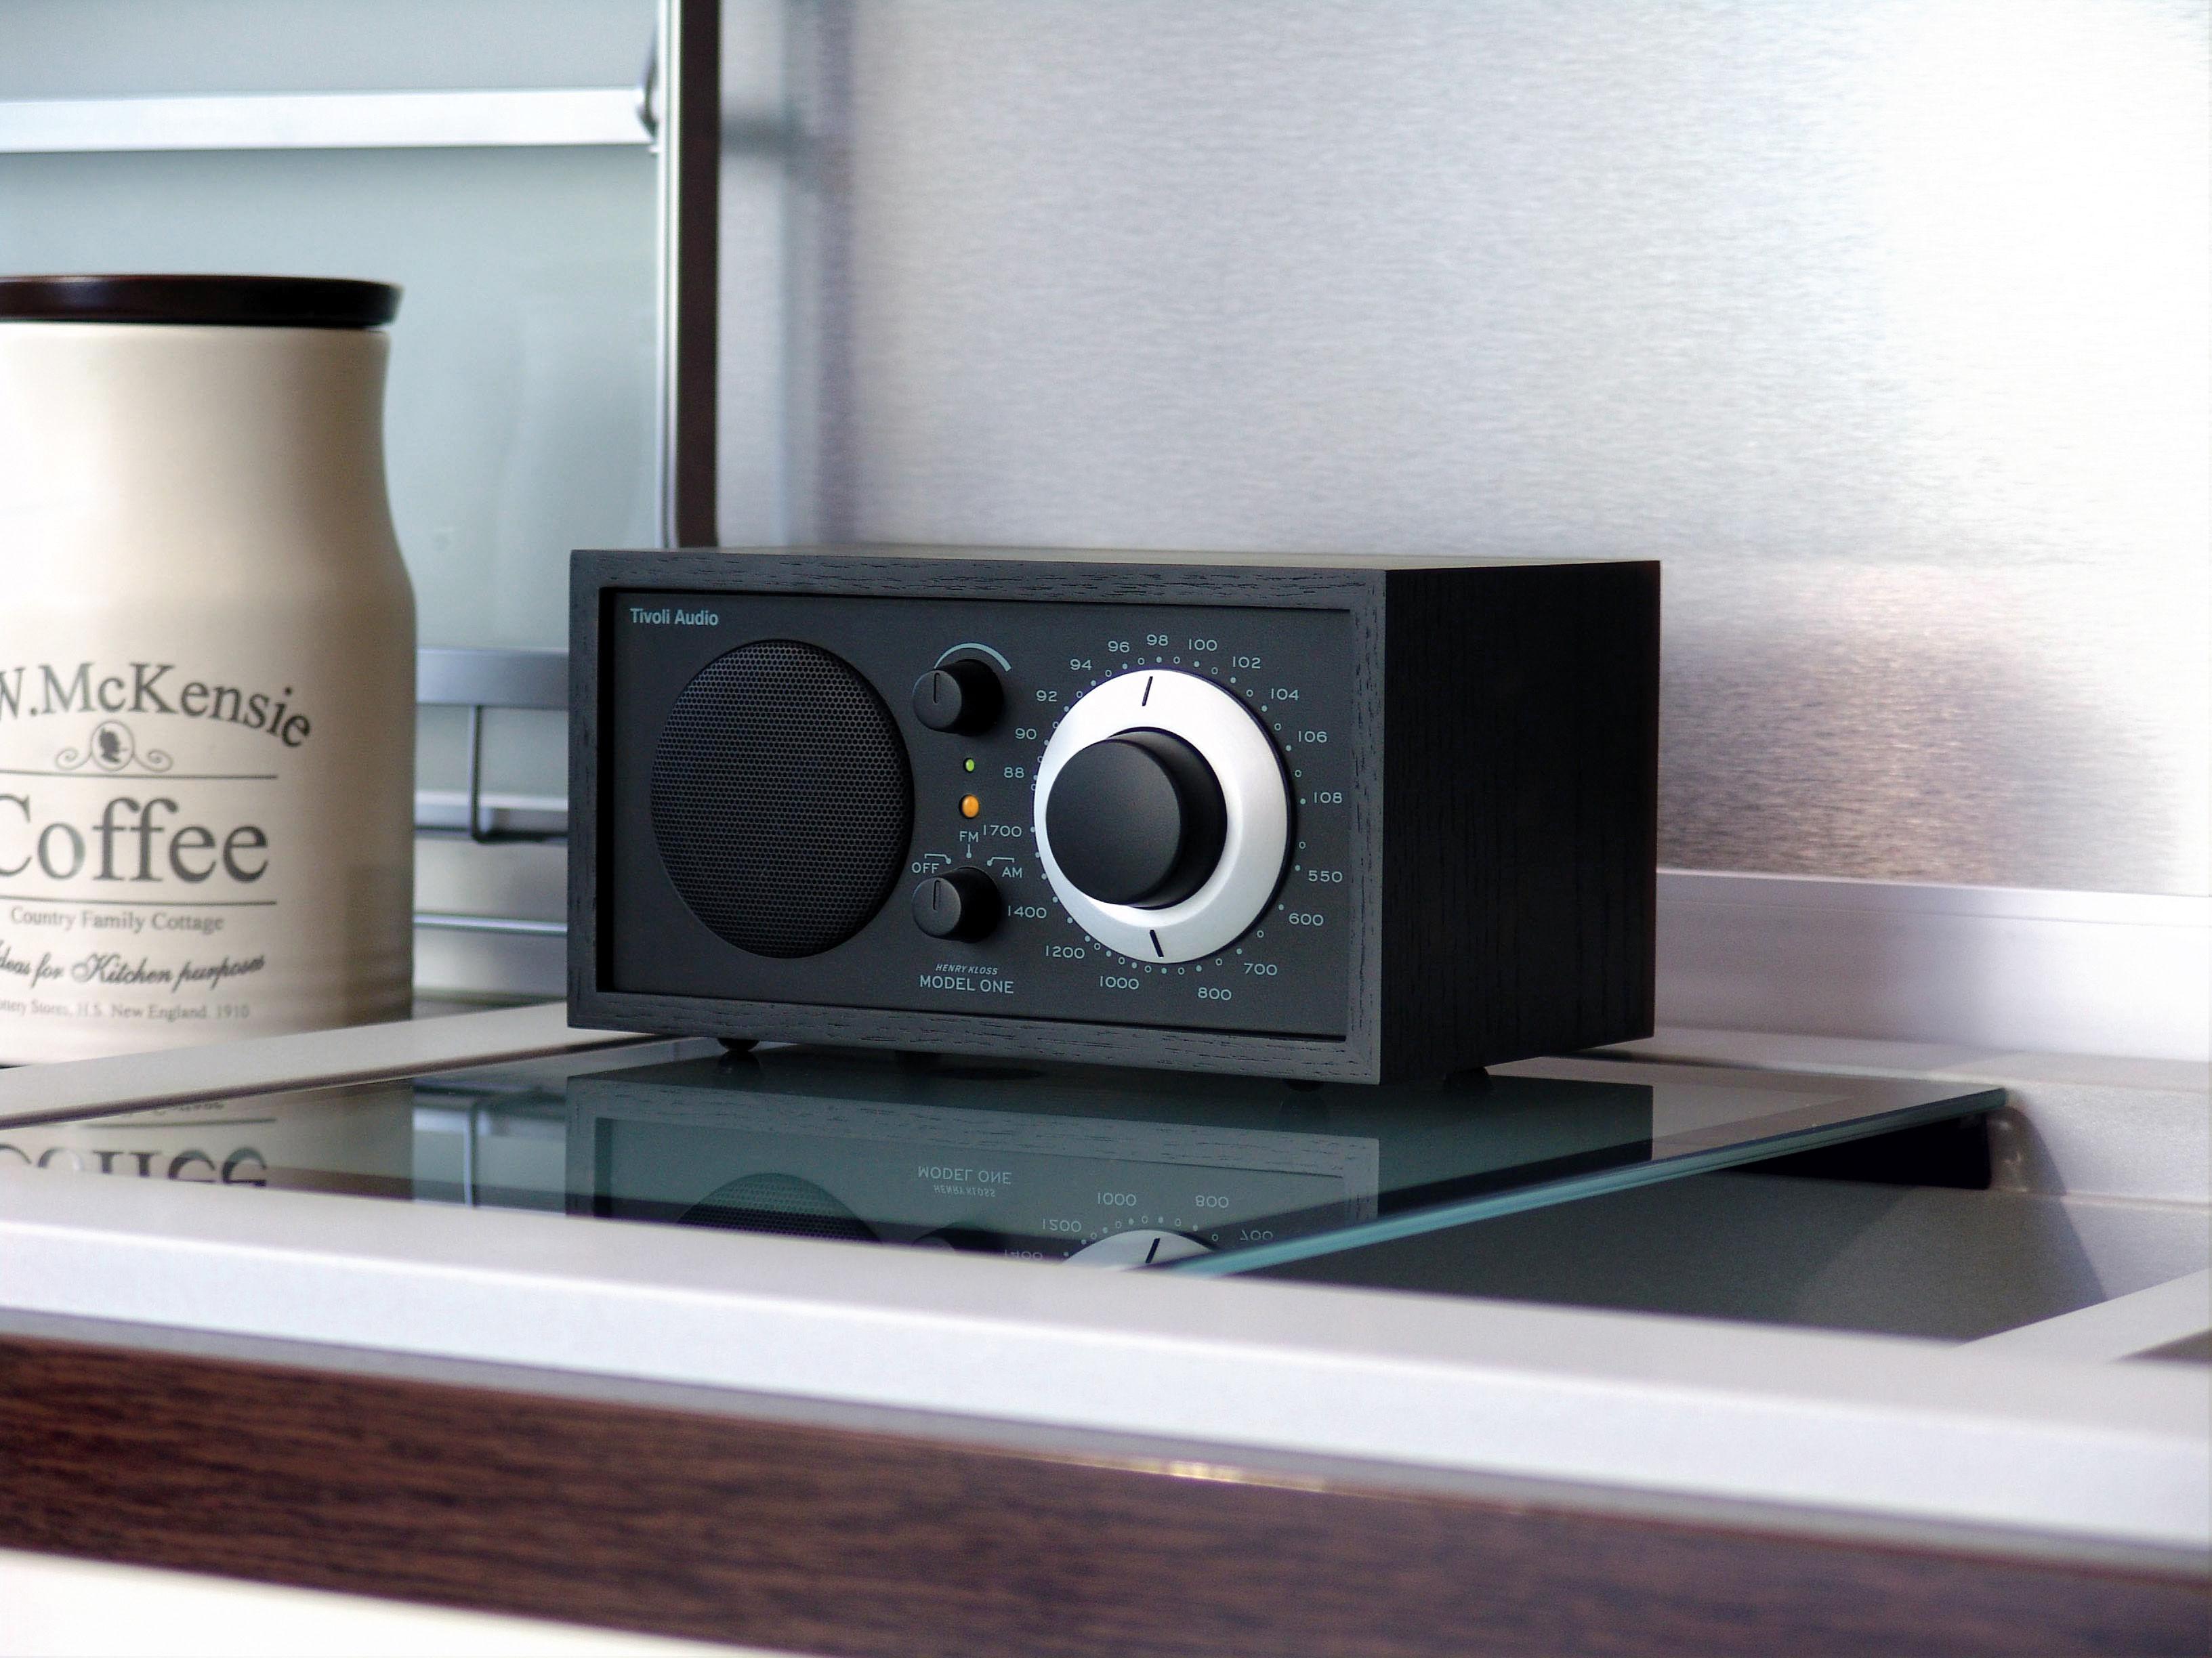 radio model one enceinte compatible ipod noir noir tivoli audio. Black Bedroom Furniture Sets. Home Design Ideas